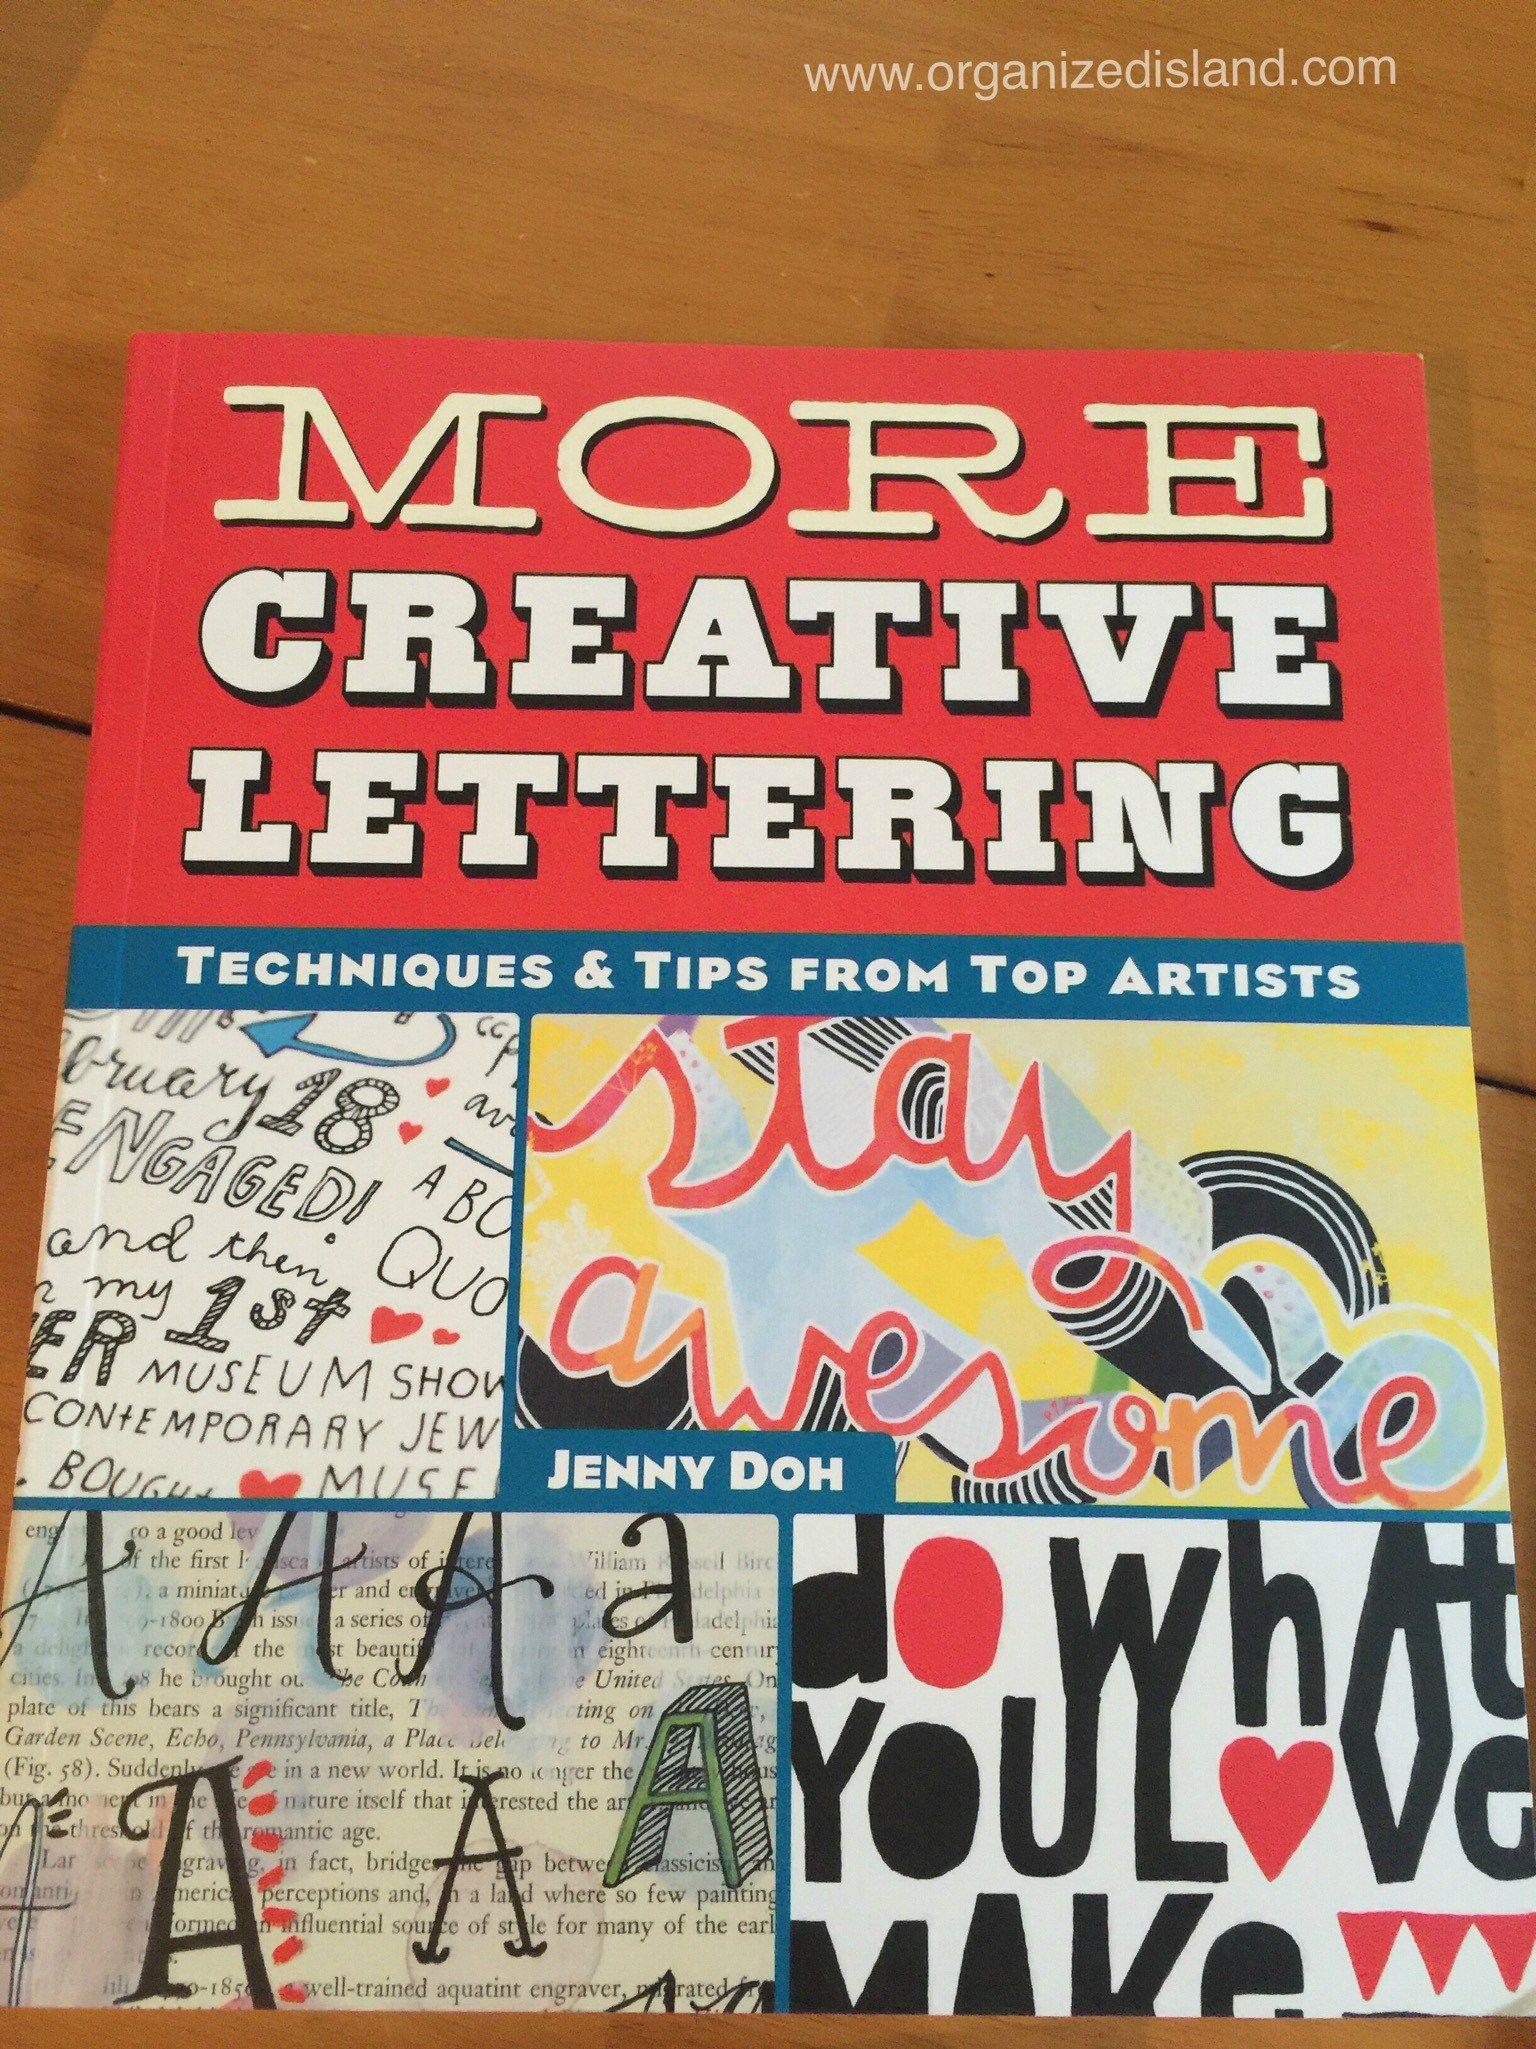 Diy Home Decor Craft Idea Books Organized Island Decor Crafts Diy Home Decor Creative Lettering